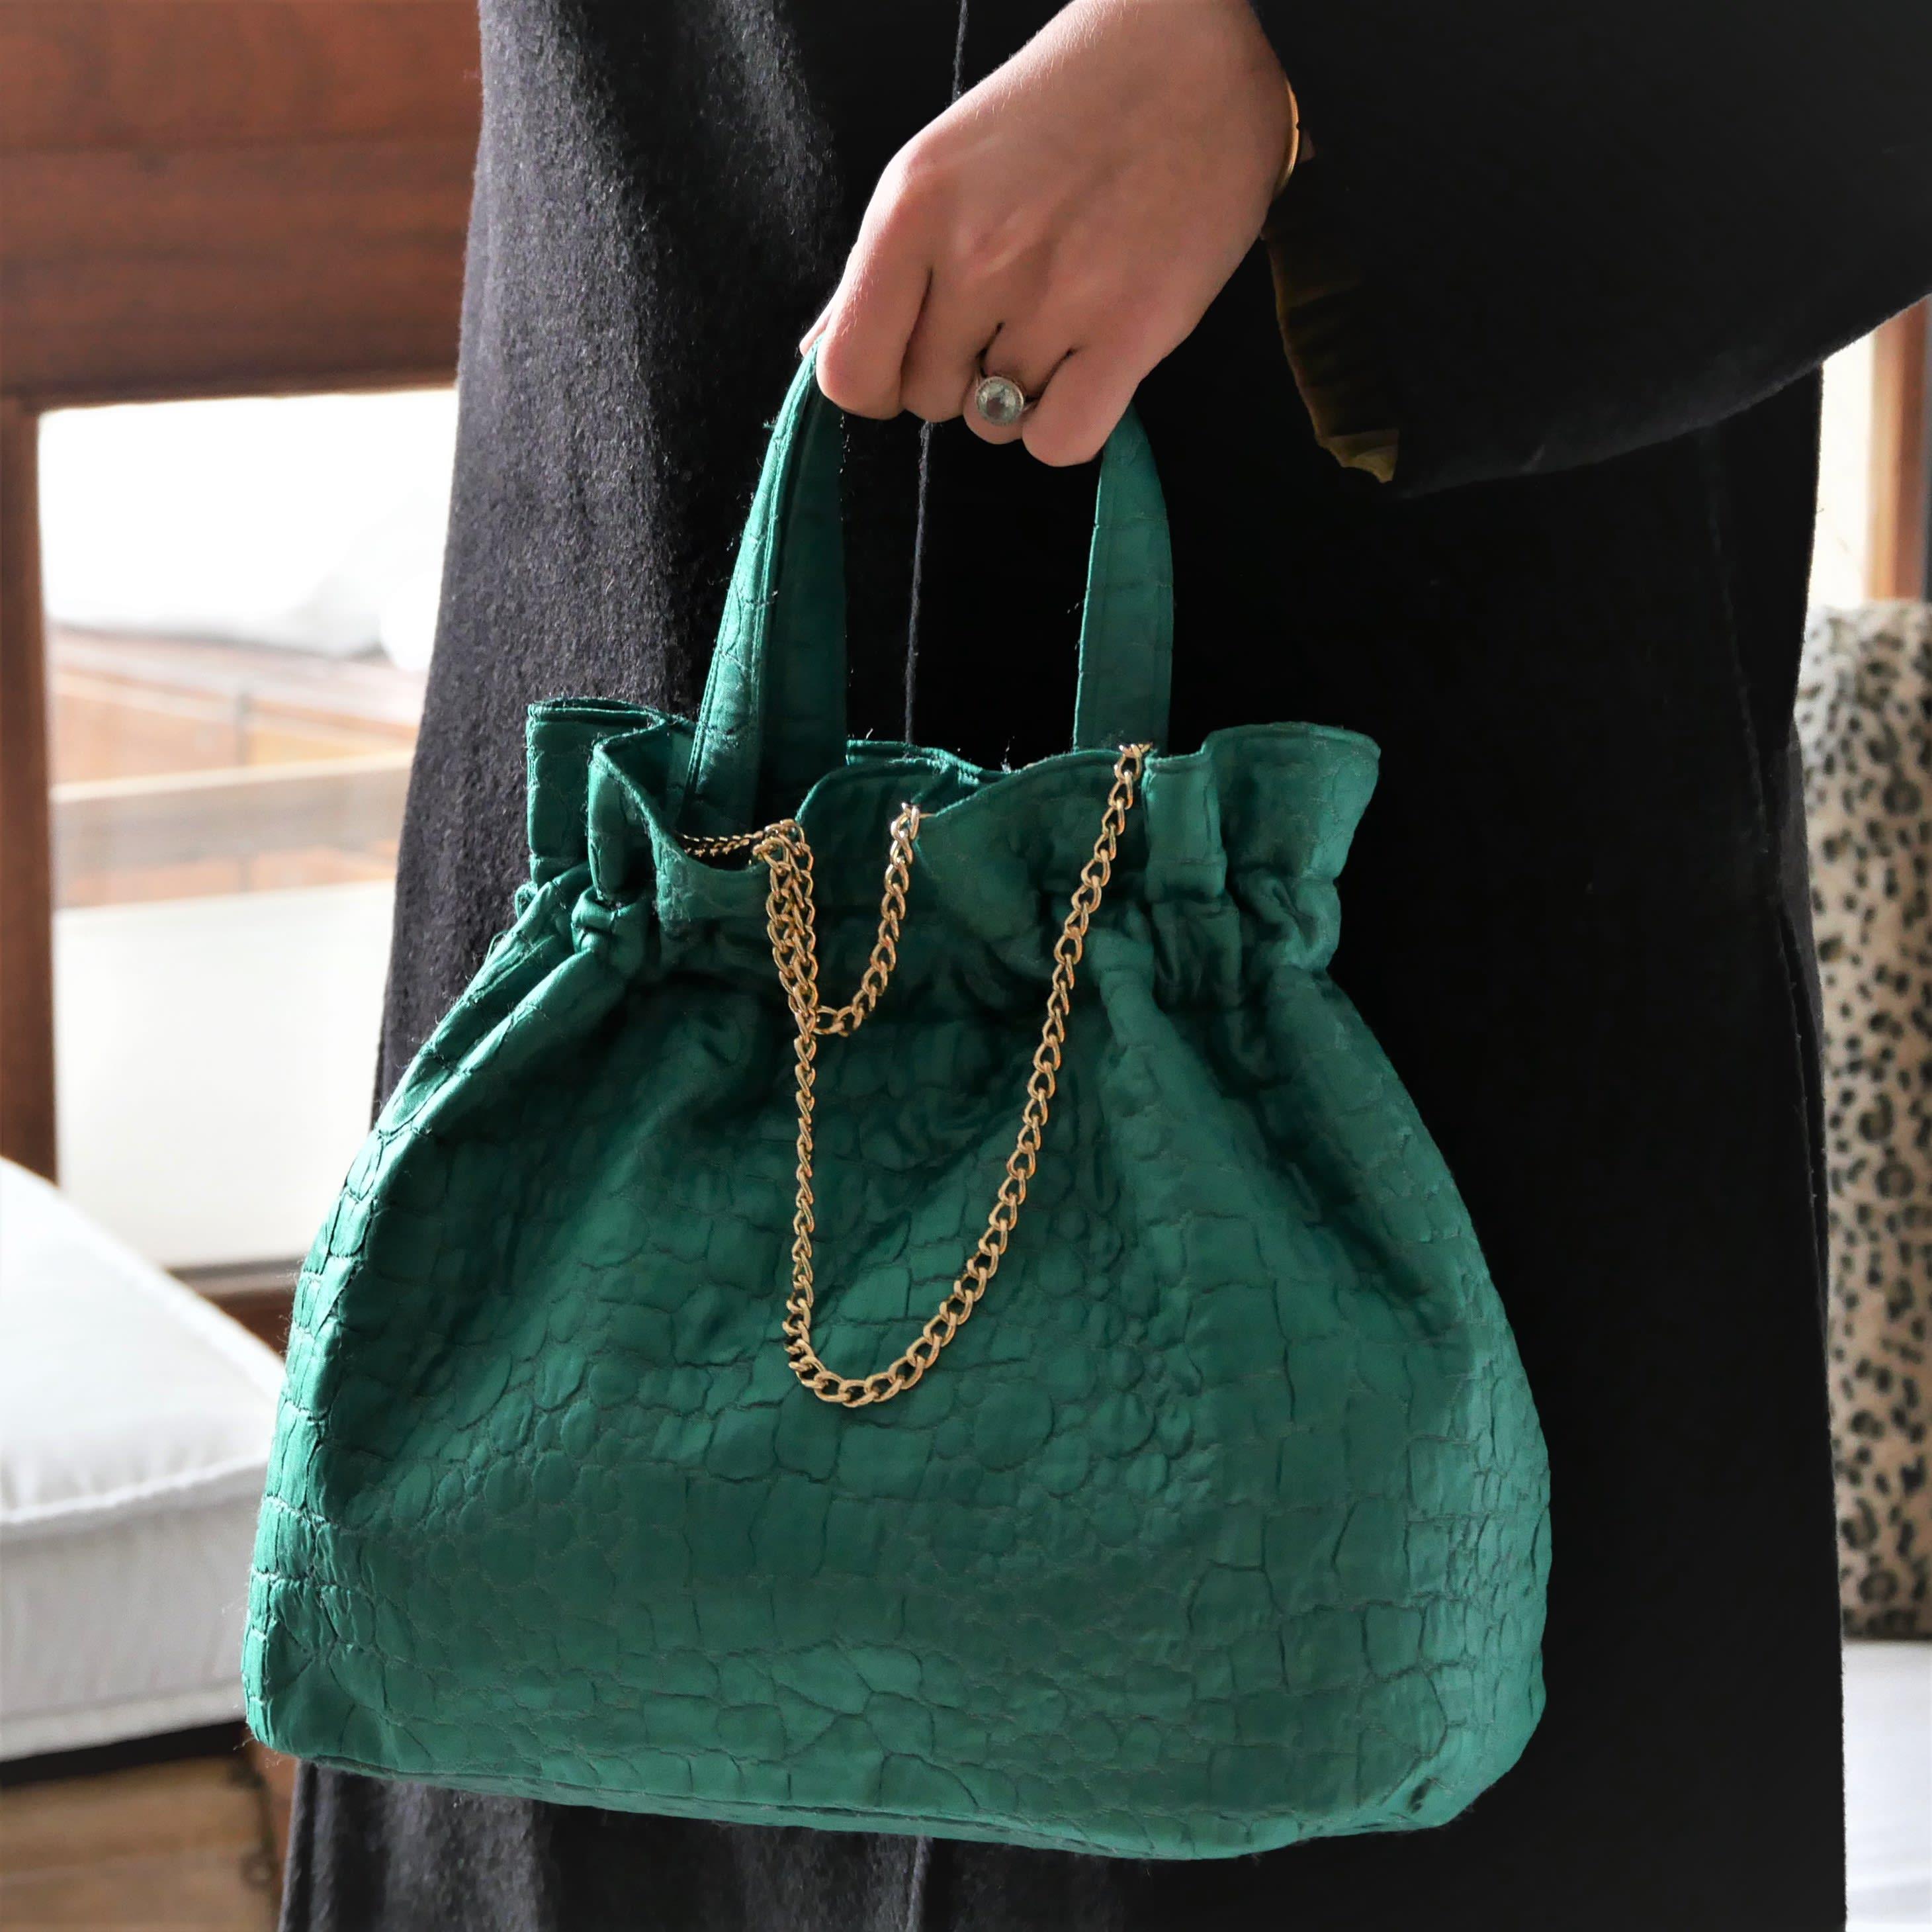 Fifties original emeral green purse. Crocodile skin design vintage fabric bag with removable chain. Washable, handmade.